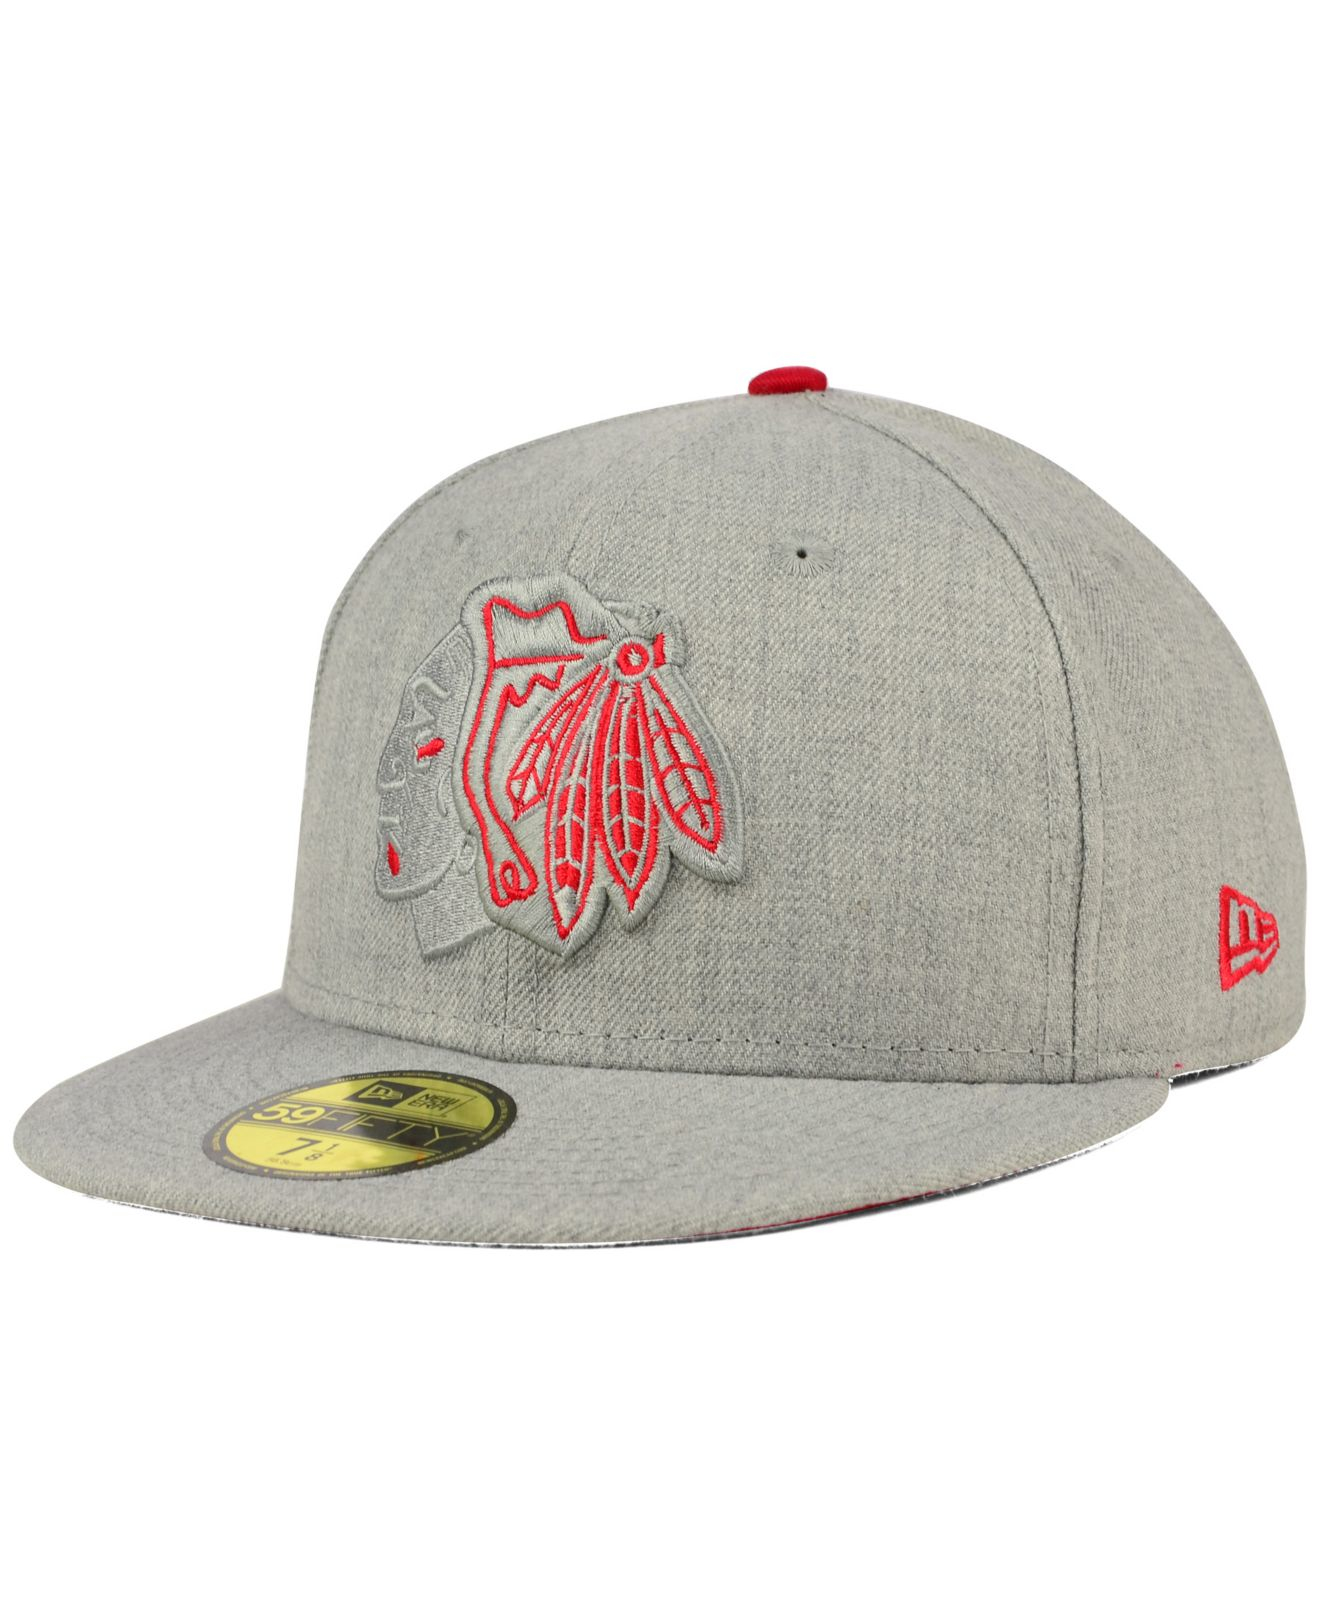 Lyst - KTZ Chicago Blackhawks Heather League Basic 59fifty Cap in ... 09e6ed28af73